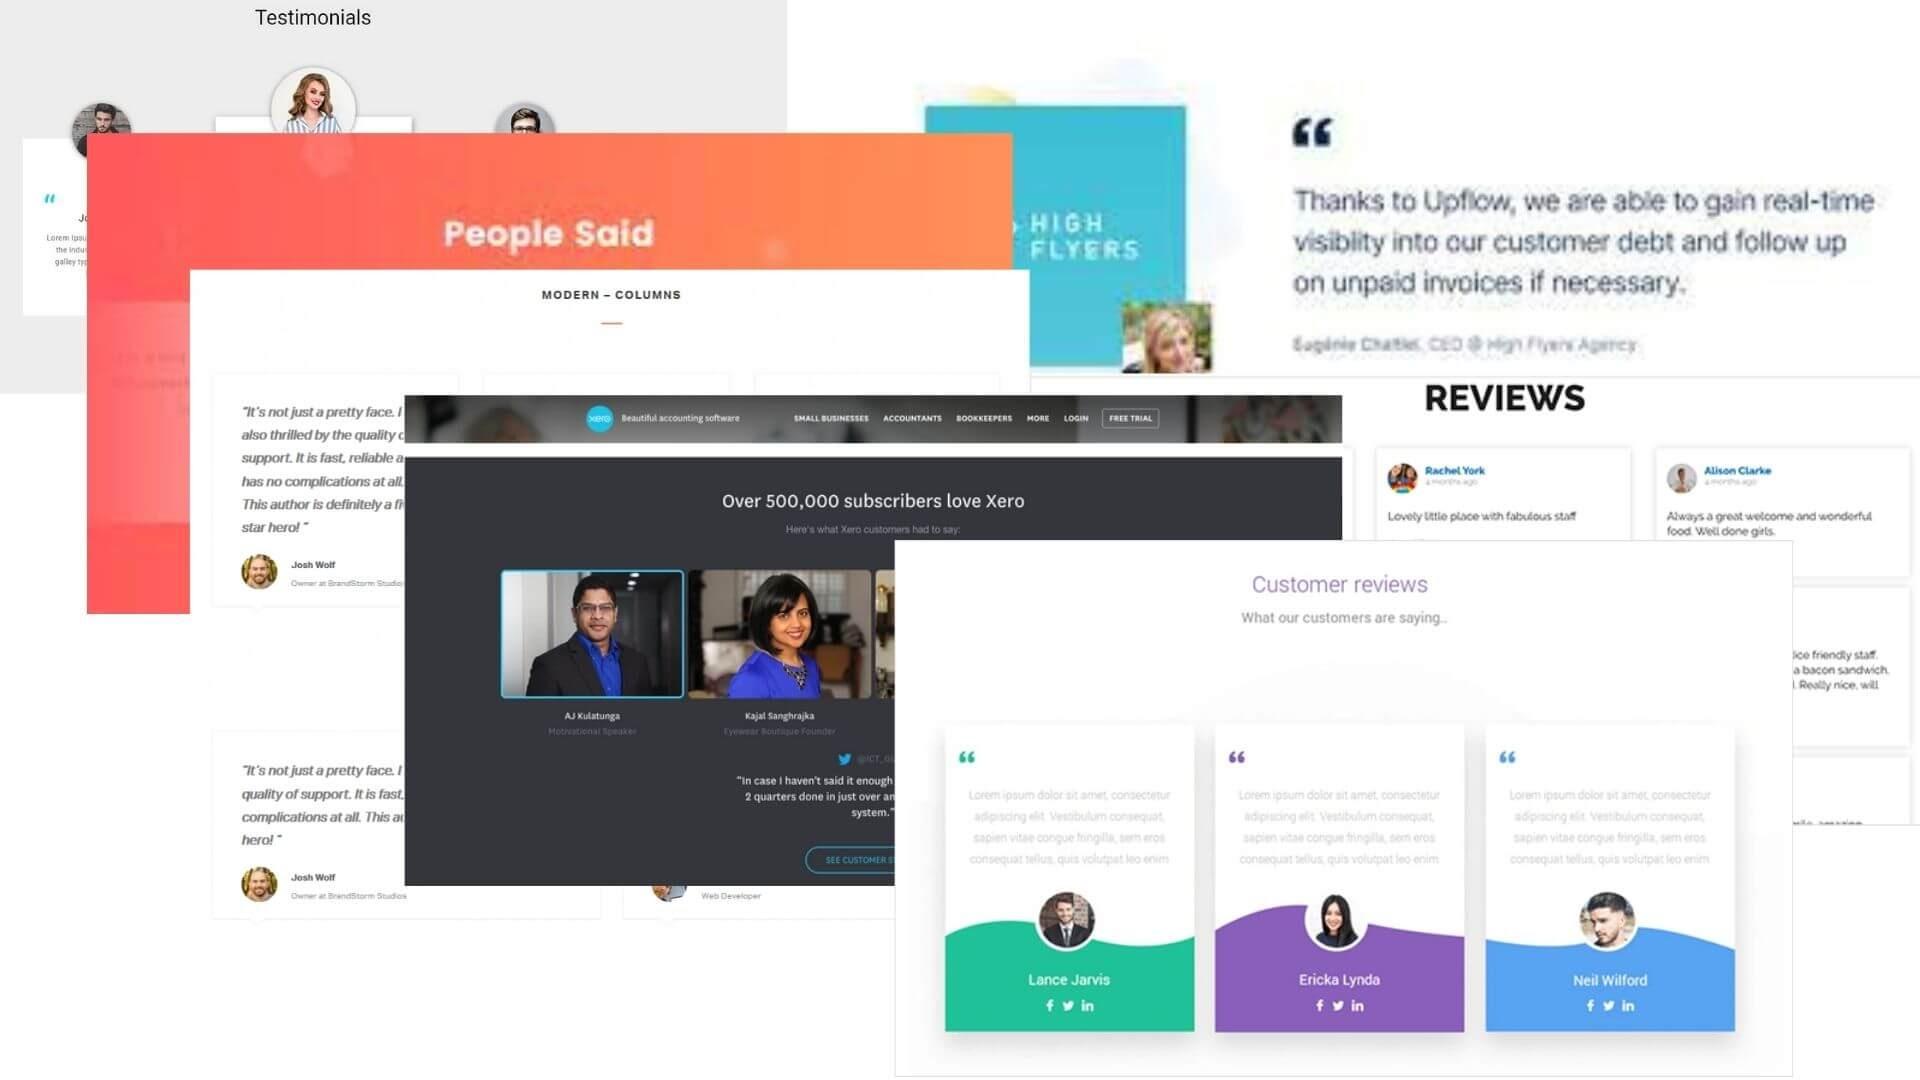 the use of testimonials on companies' websites